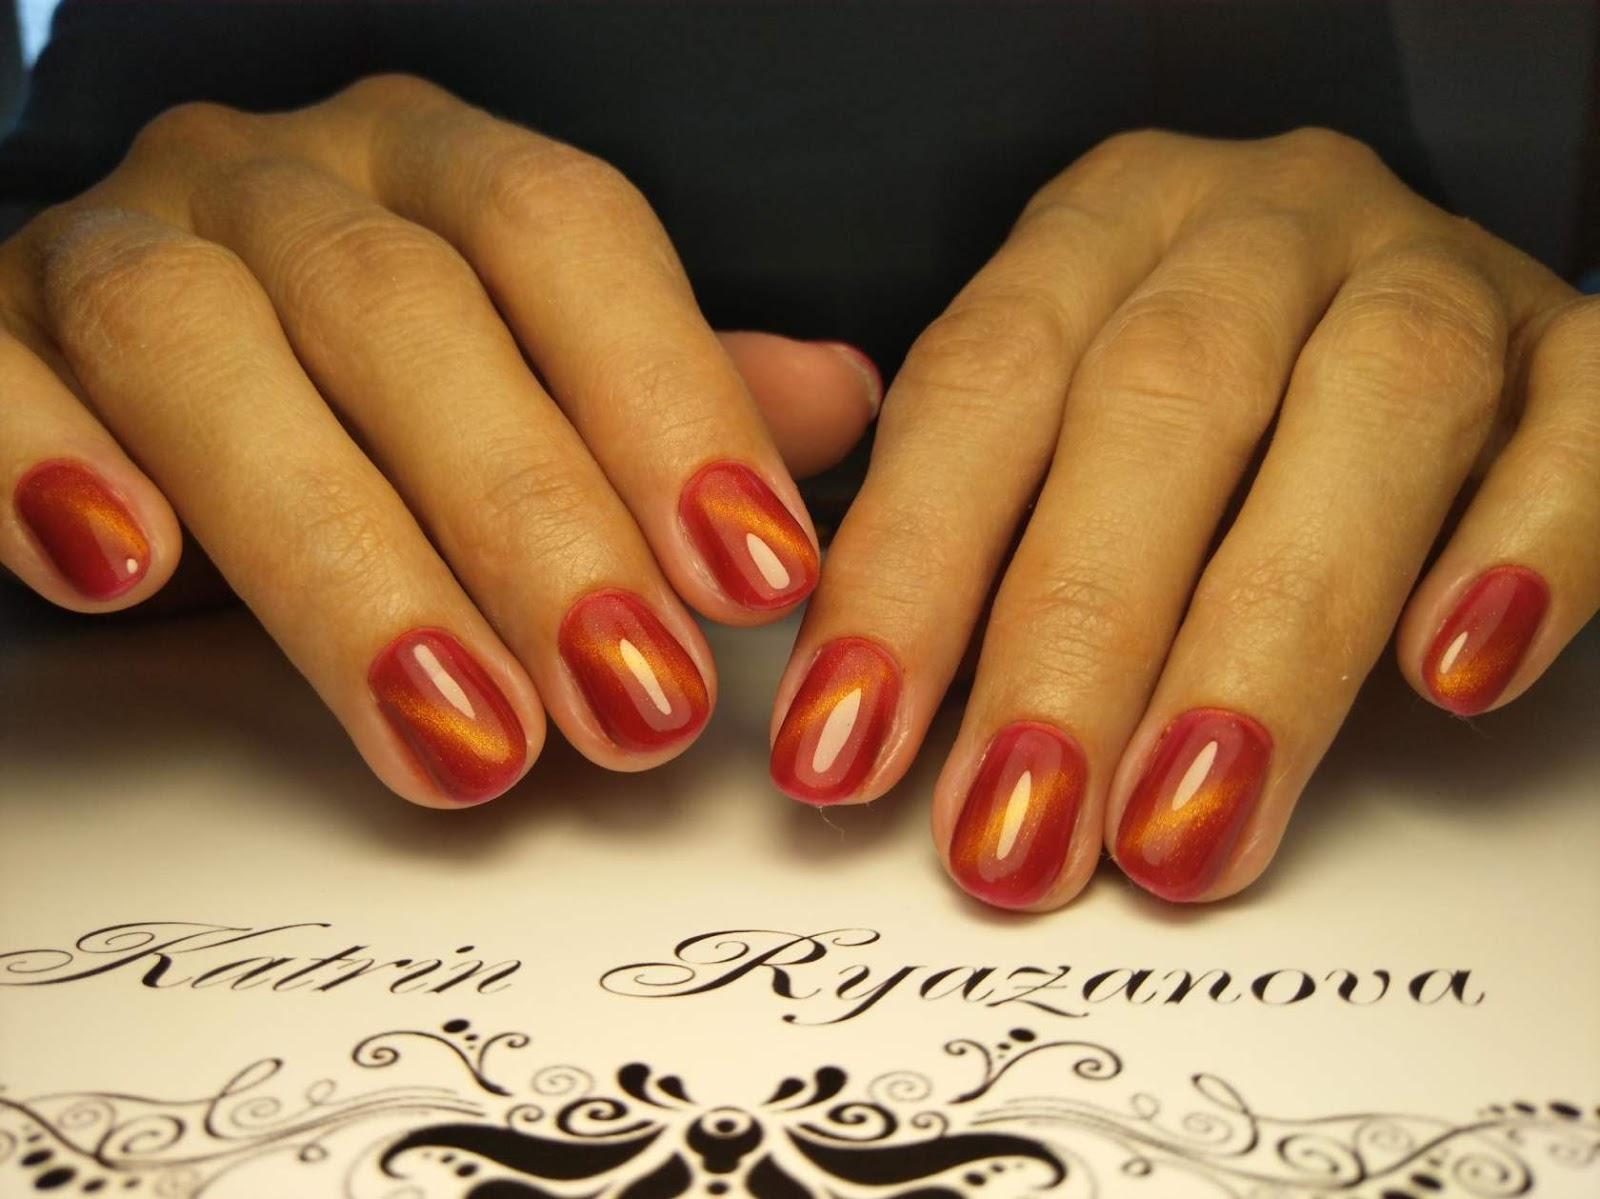 Black White Nails Art Disign Nail Salon Longmont Co